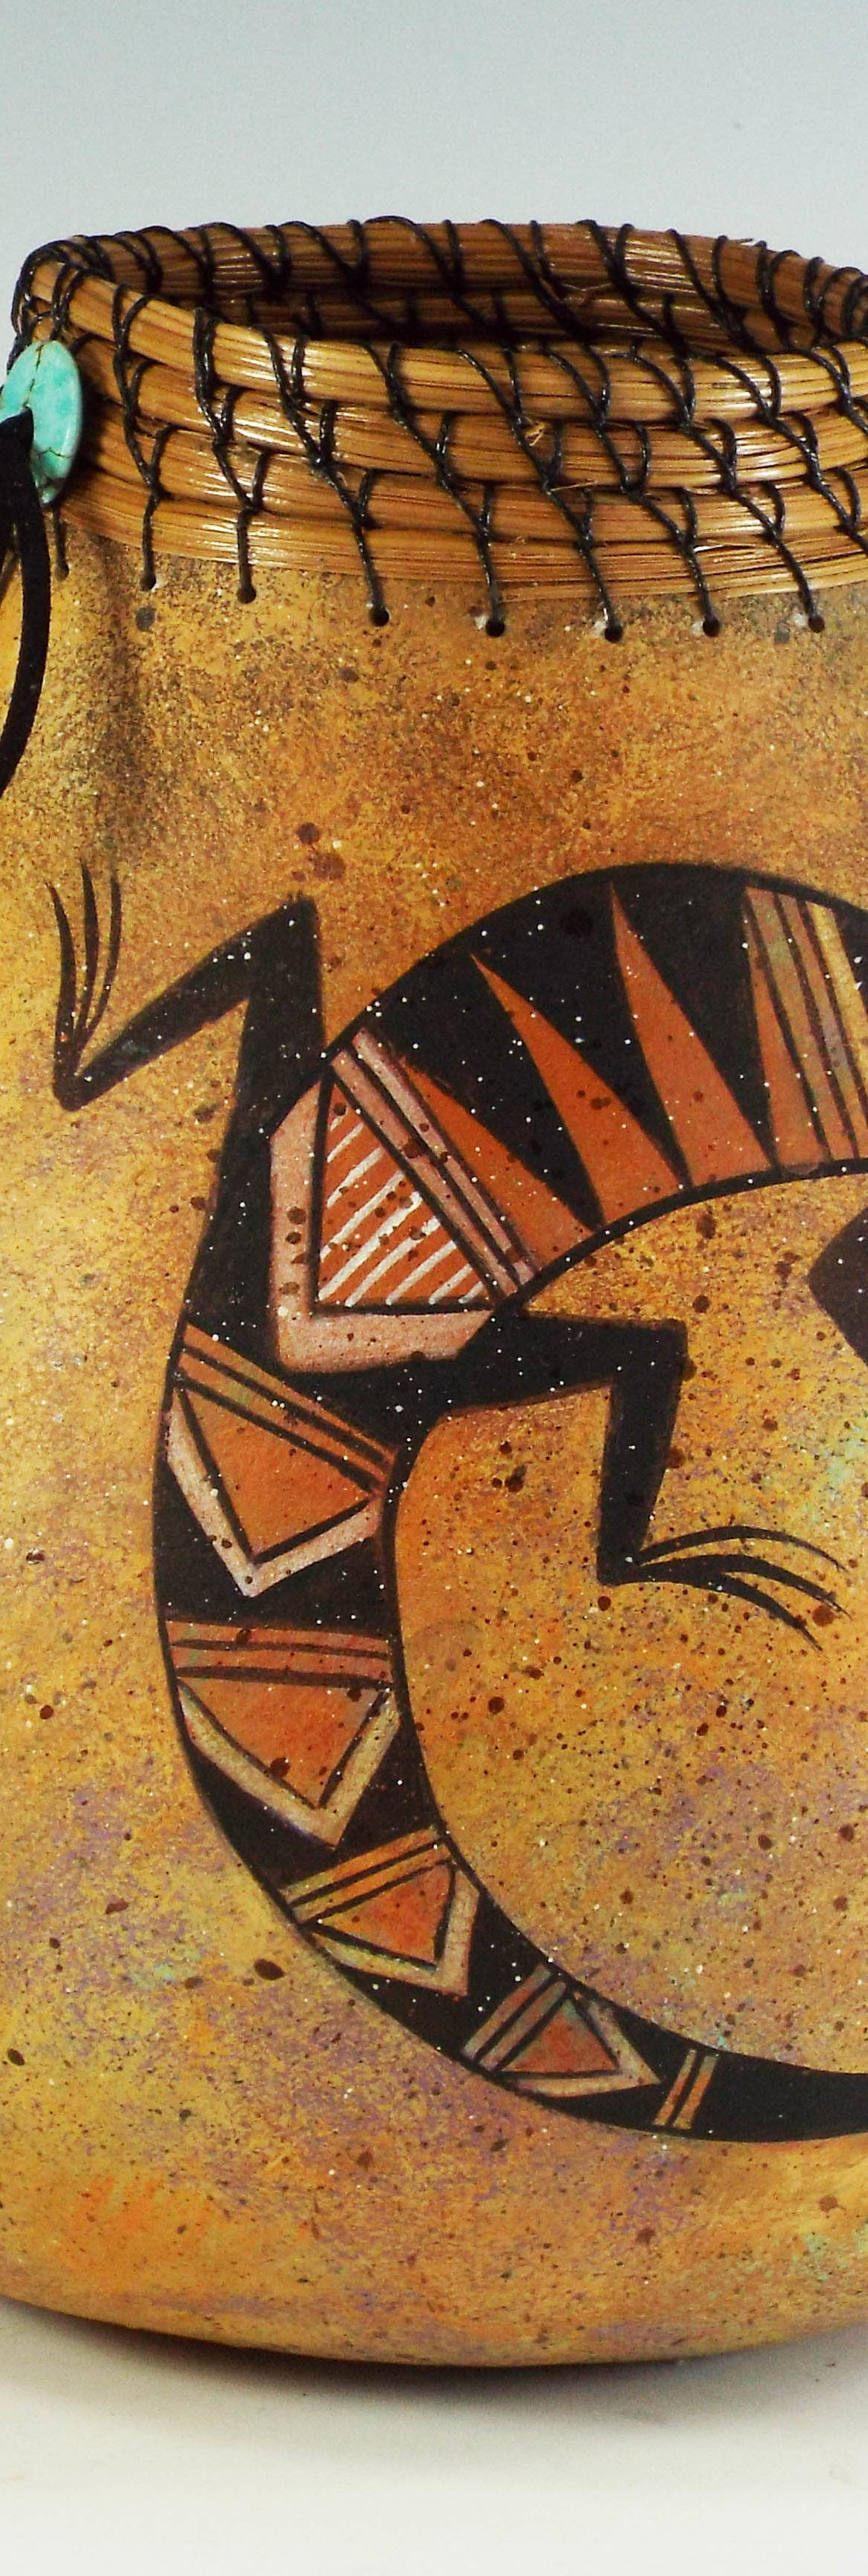 Lizards Galore, Judy Richie Gourd Art, Rogoway Gallery